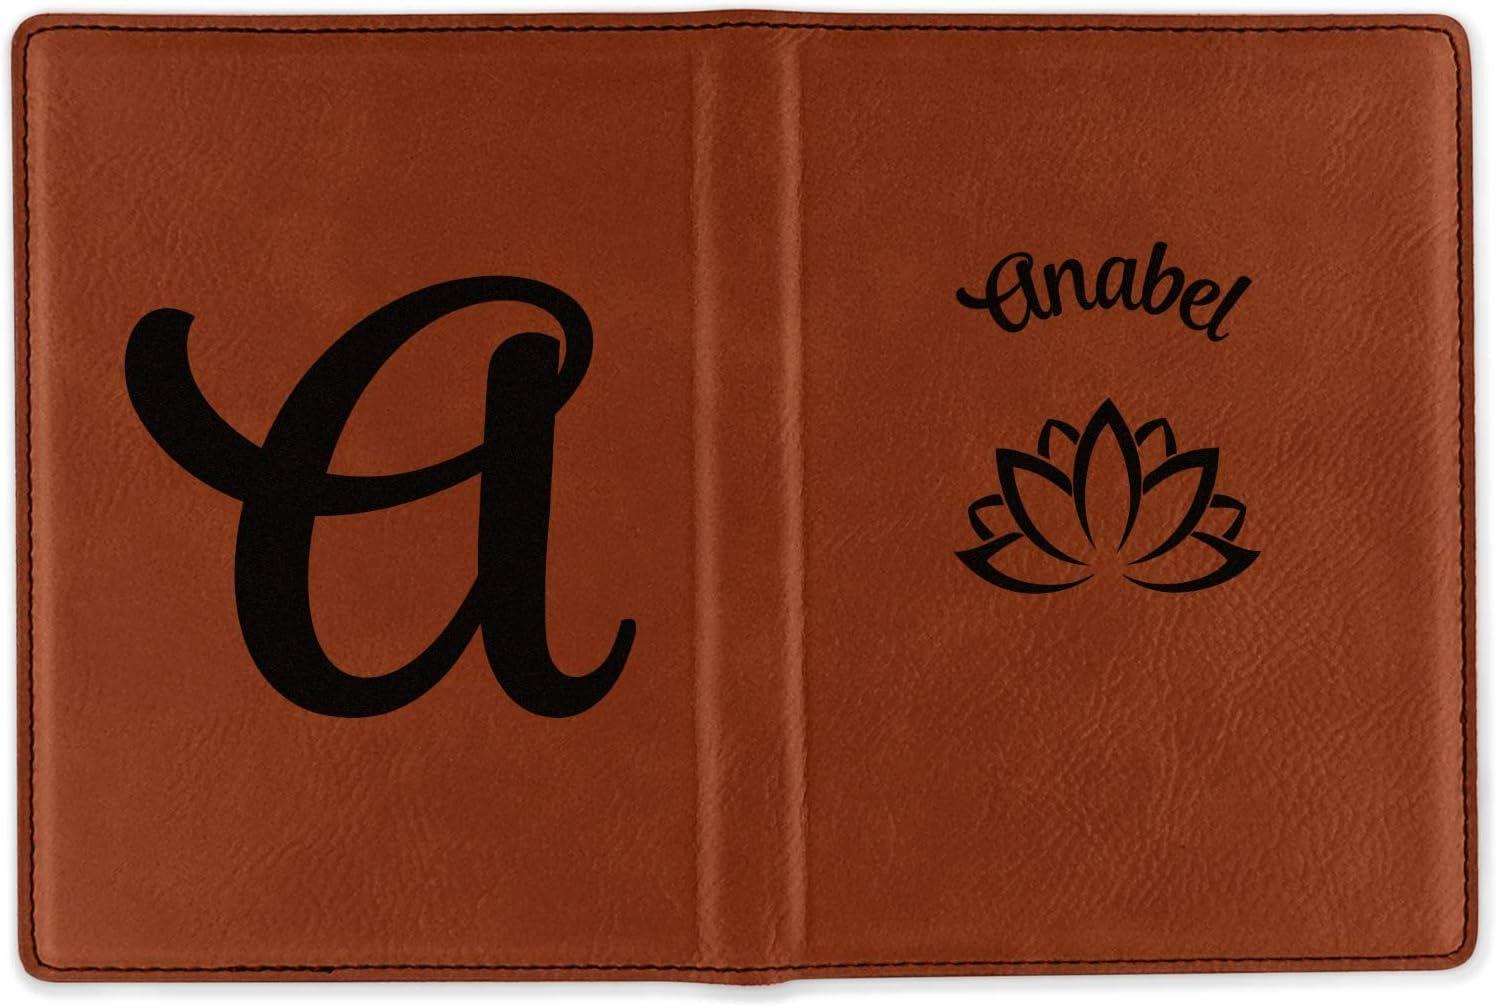 P125 travel accessories FREE name monogram Custom Personalized PU leather Passport Holder travel wallet travel holder Cute Bear /& Rabbit